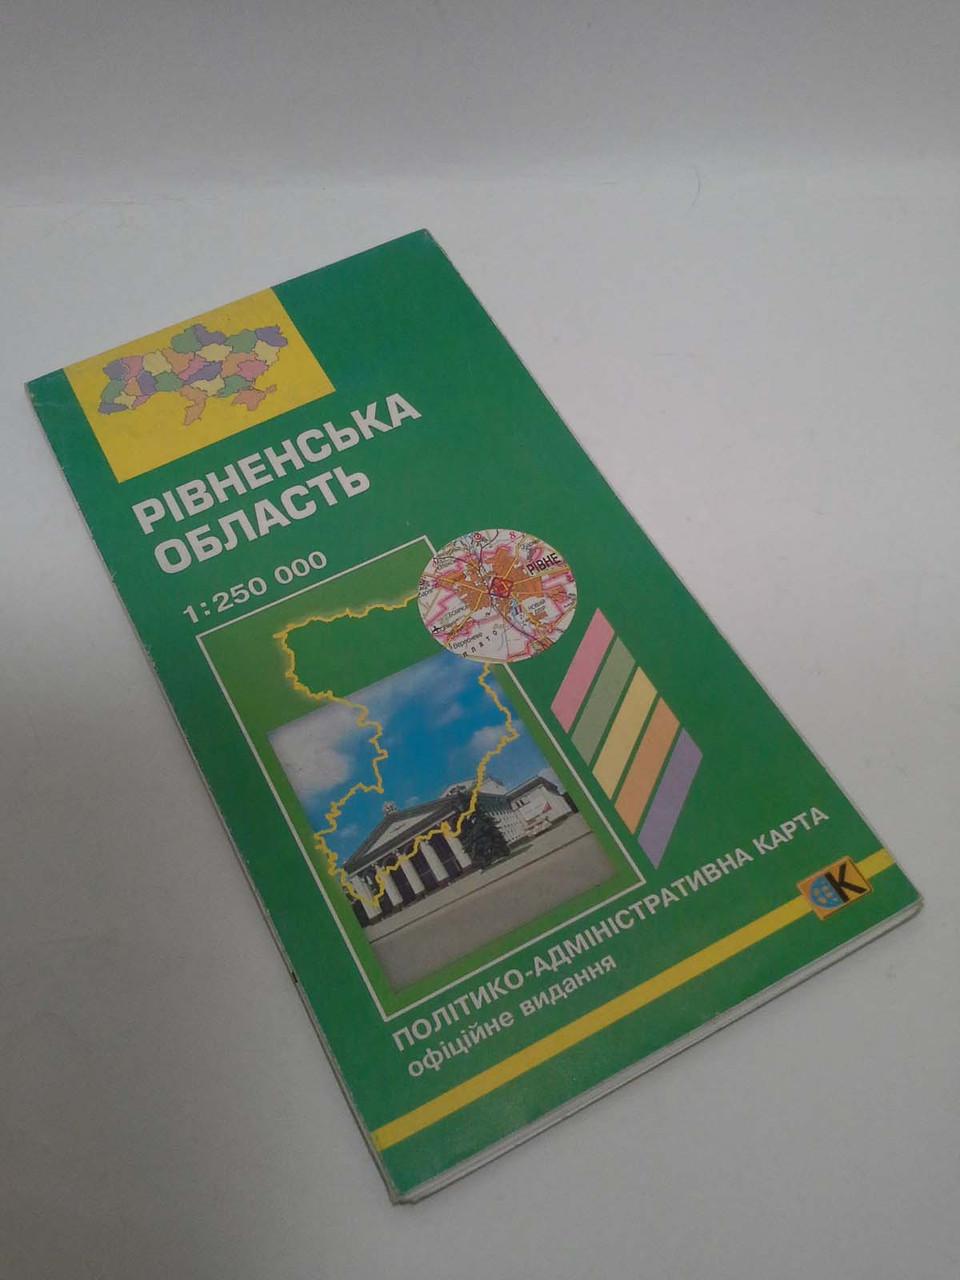 акКРТ До Авто (1:250 000) Рівненська обл Адміністративна авто Рівненська